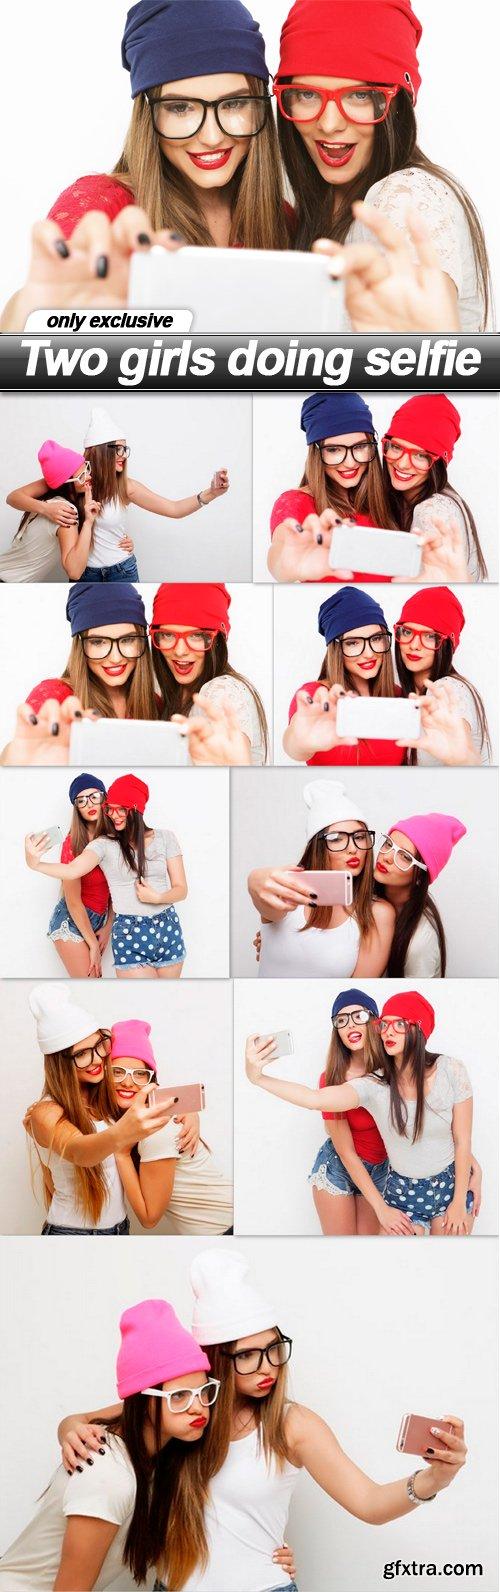 Two girls doing selfie - 9 UHQ JPEG